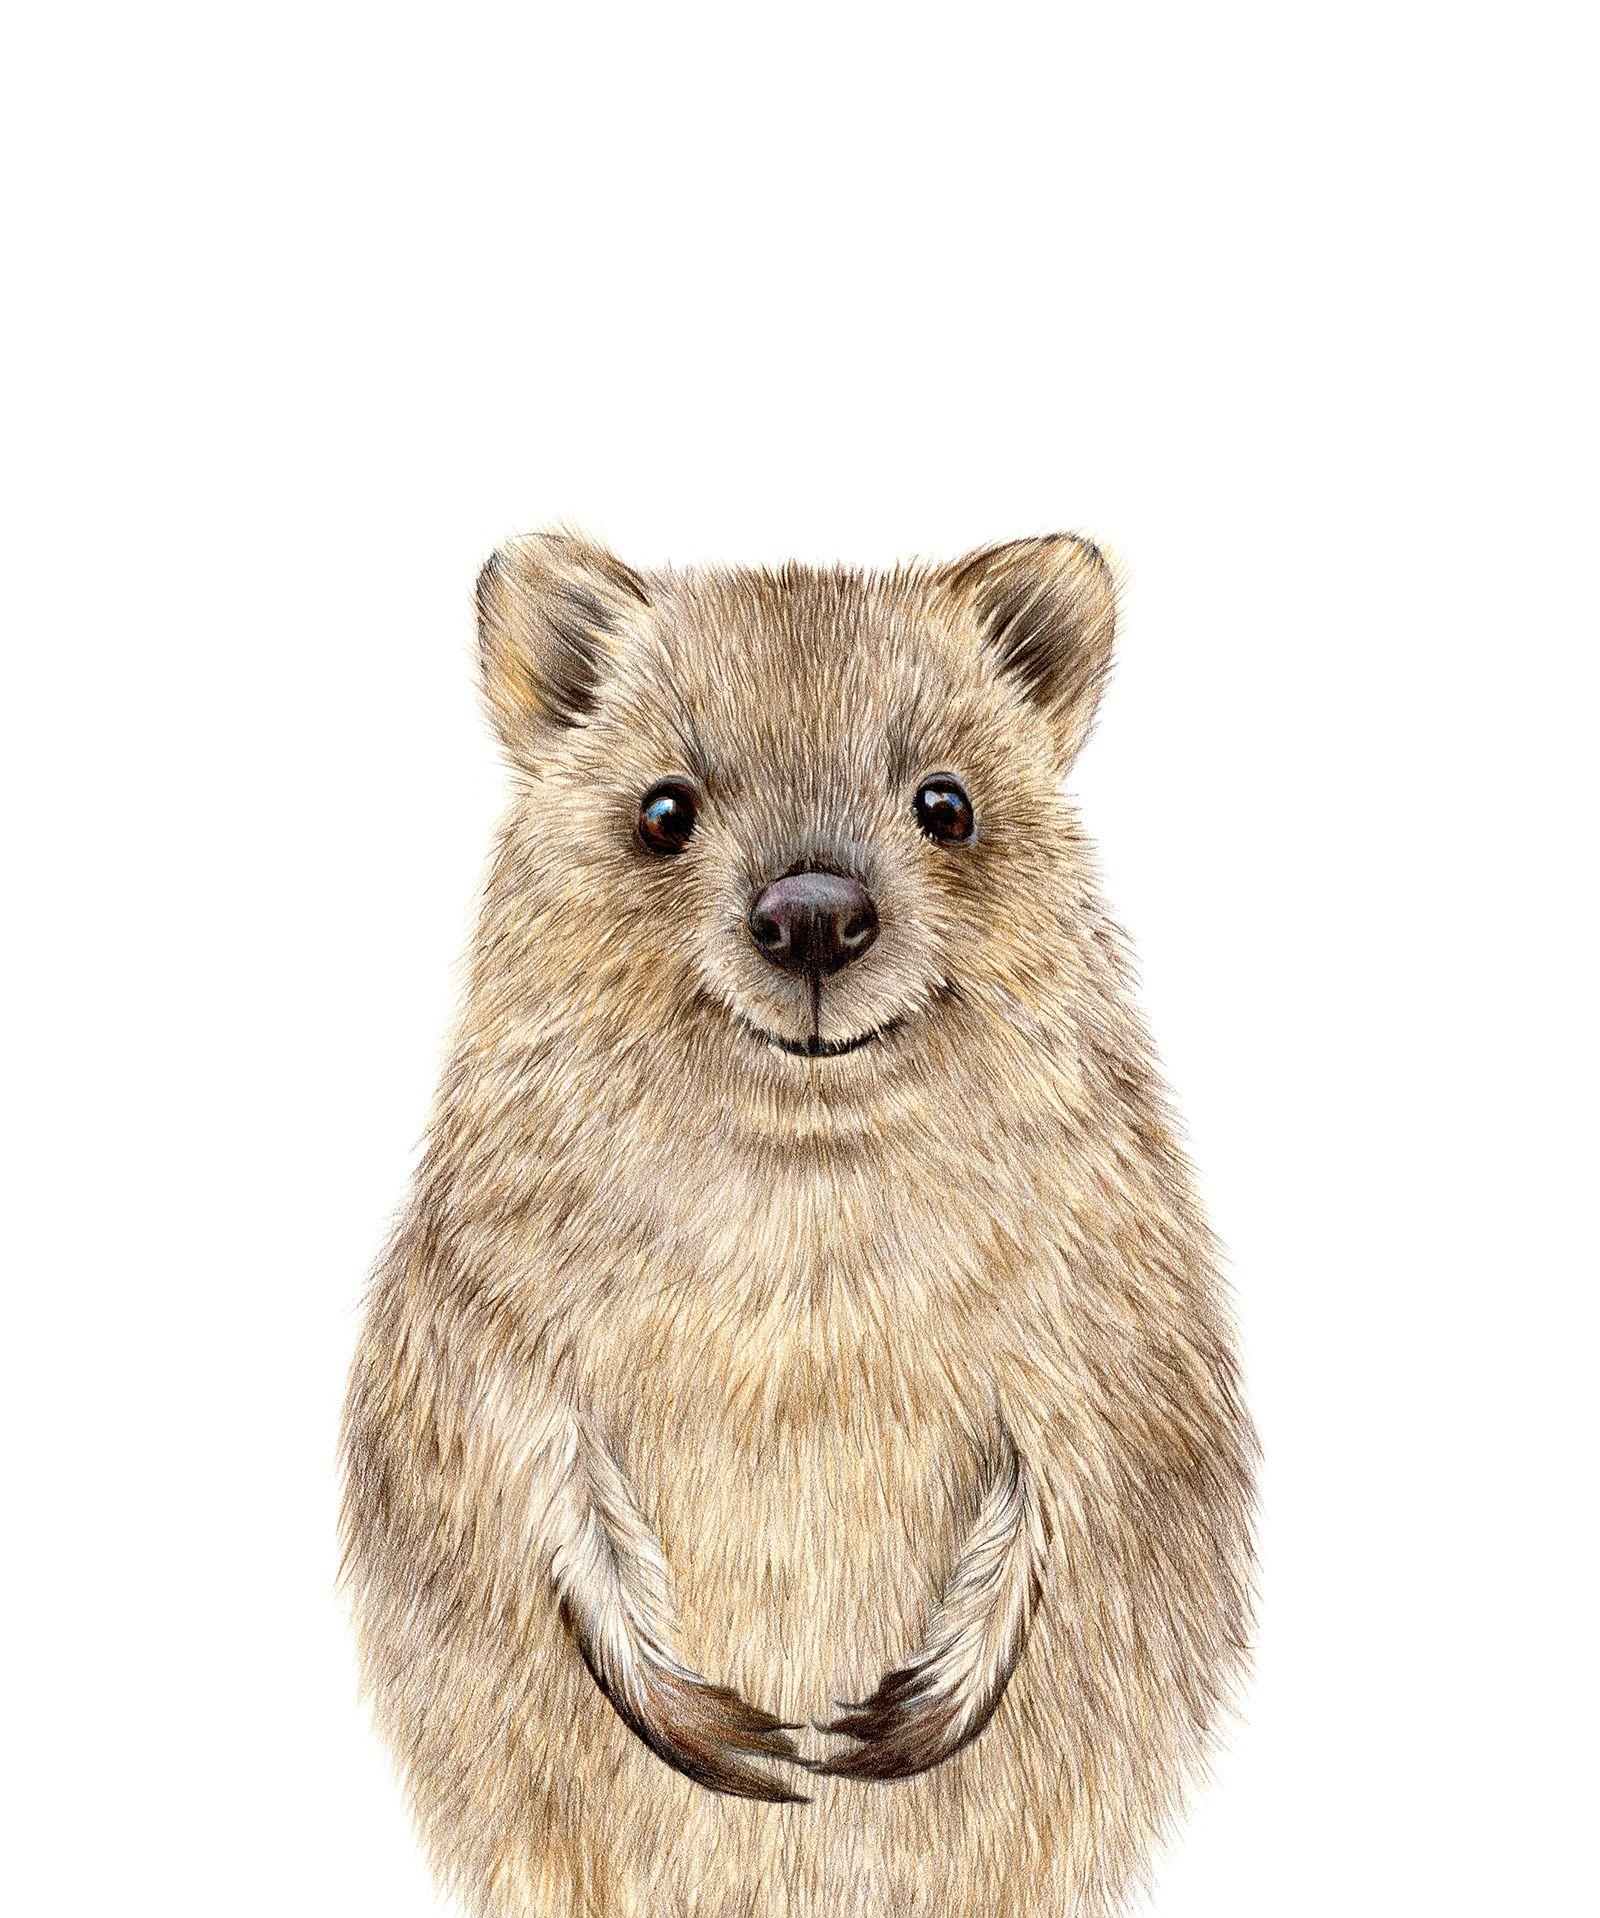 Quokka Print Nursery Baby Animals Printable Nursery Art Kids Etsy In 2020 Quokka Australian Native Animals Animal Art